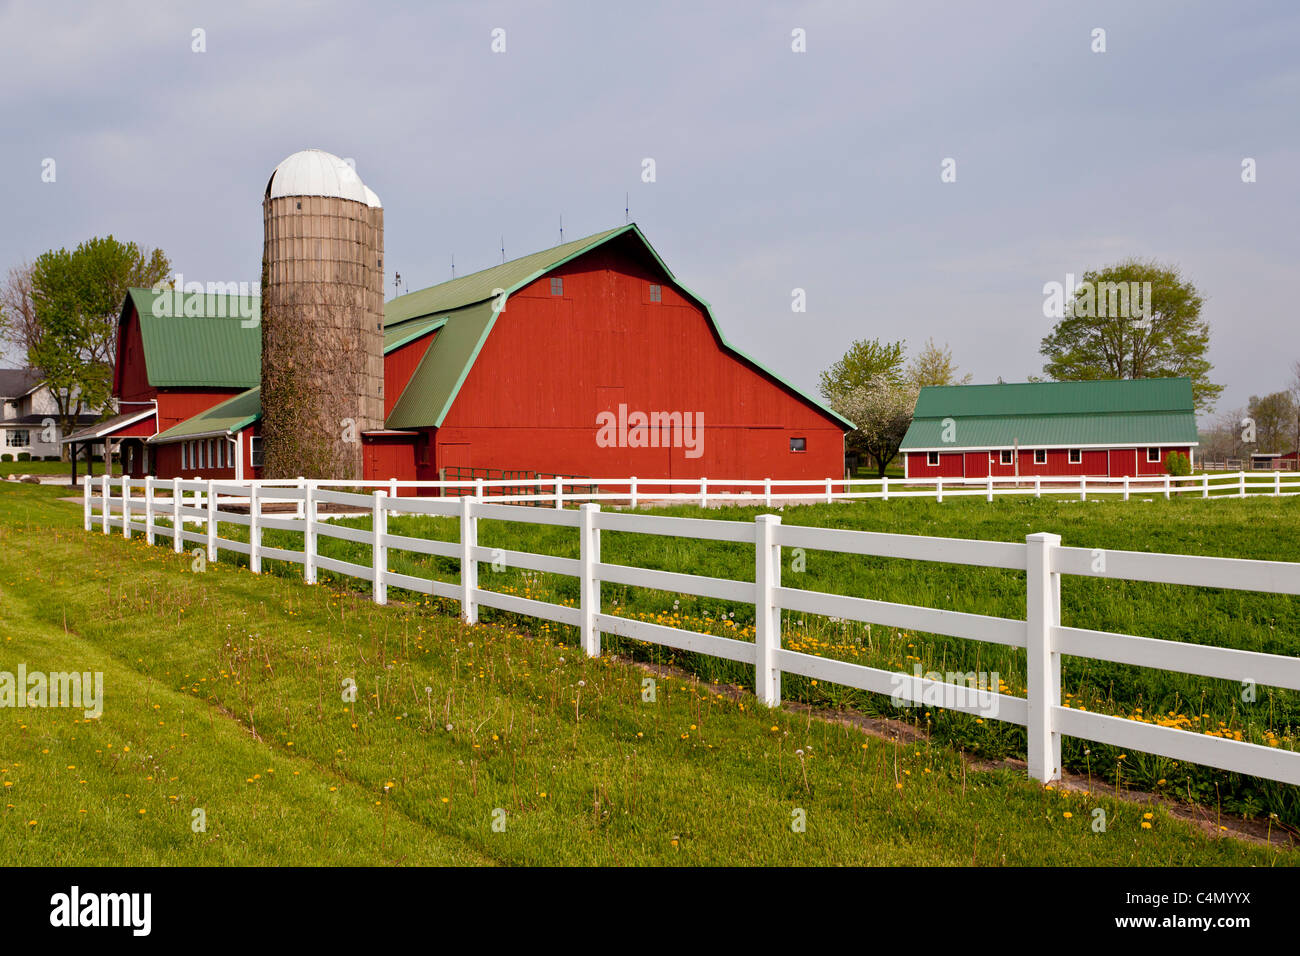 Eine rote Kuhstall mit weißen Zaun in Middlebury, Indiana, USA. Stockfoto